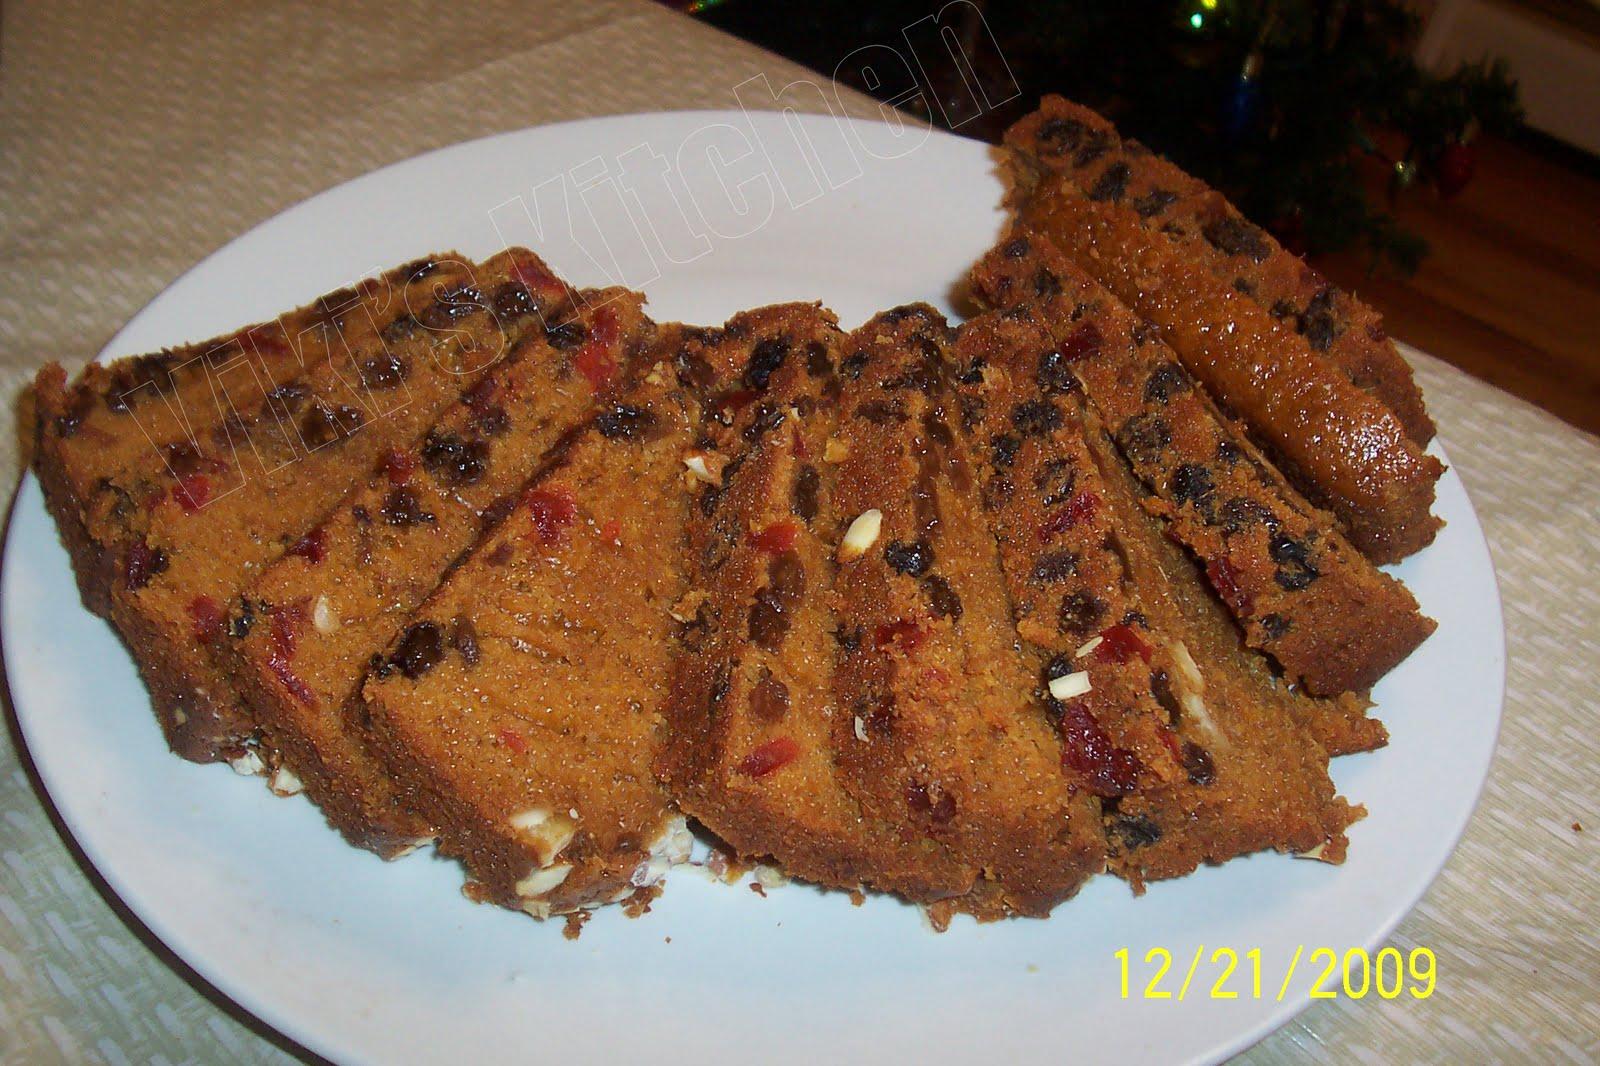 Cake Recipes In Kerala Style: Viki 's Kitchen